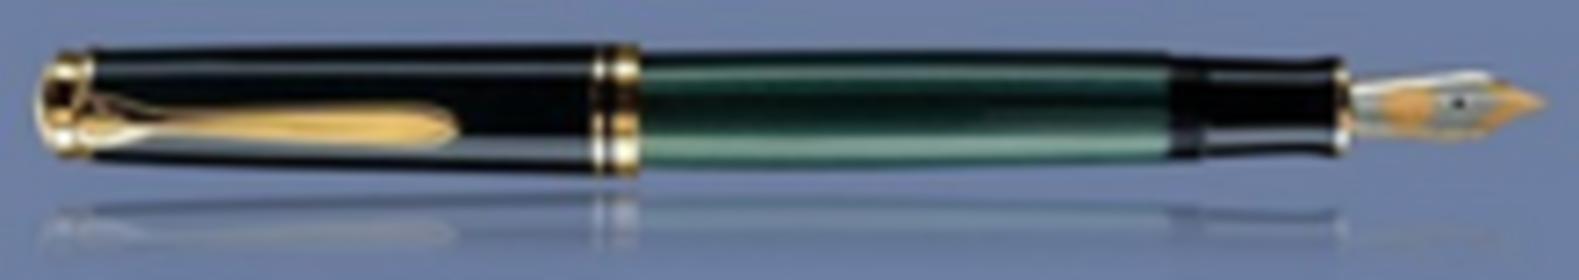 Pelikan Souveran M800 czarno-zielone, stalówka M